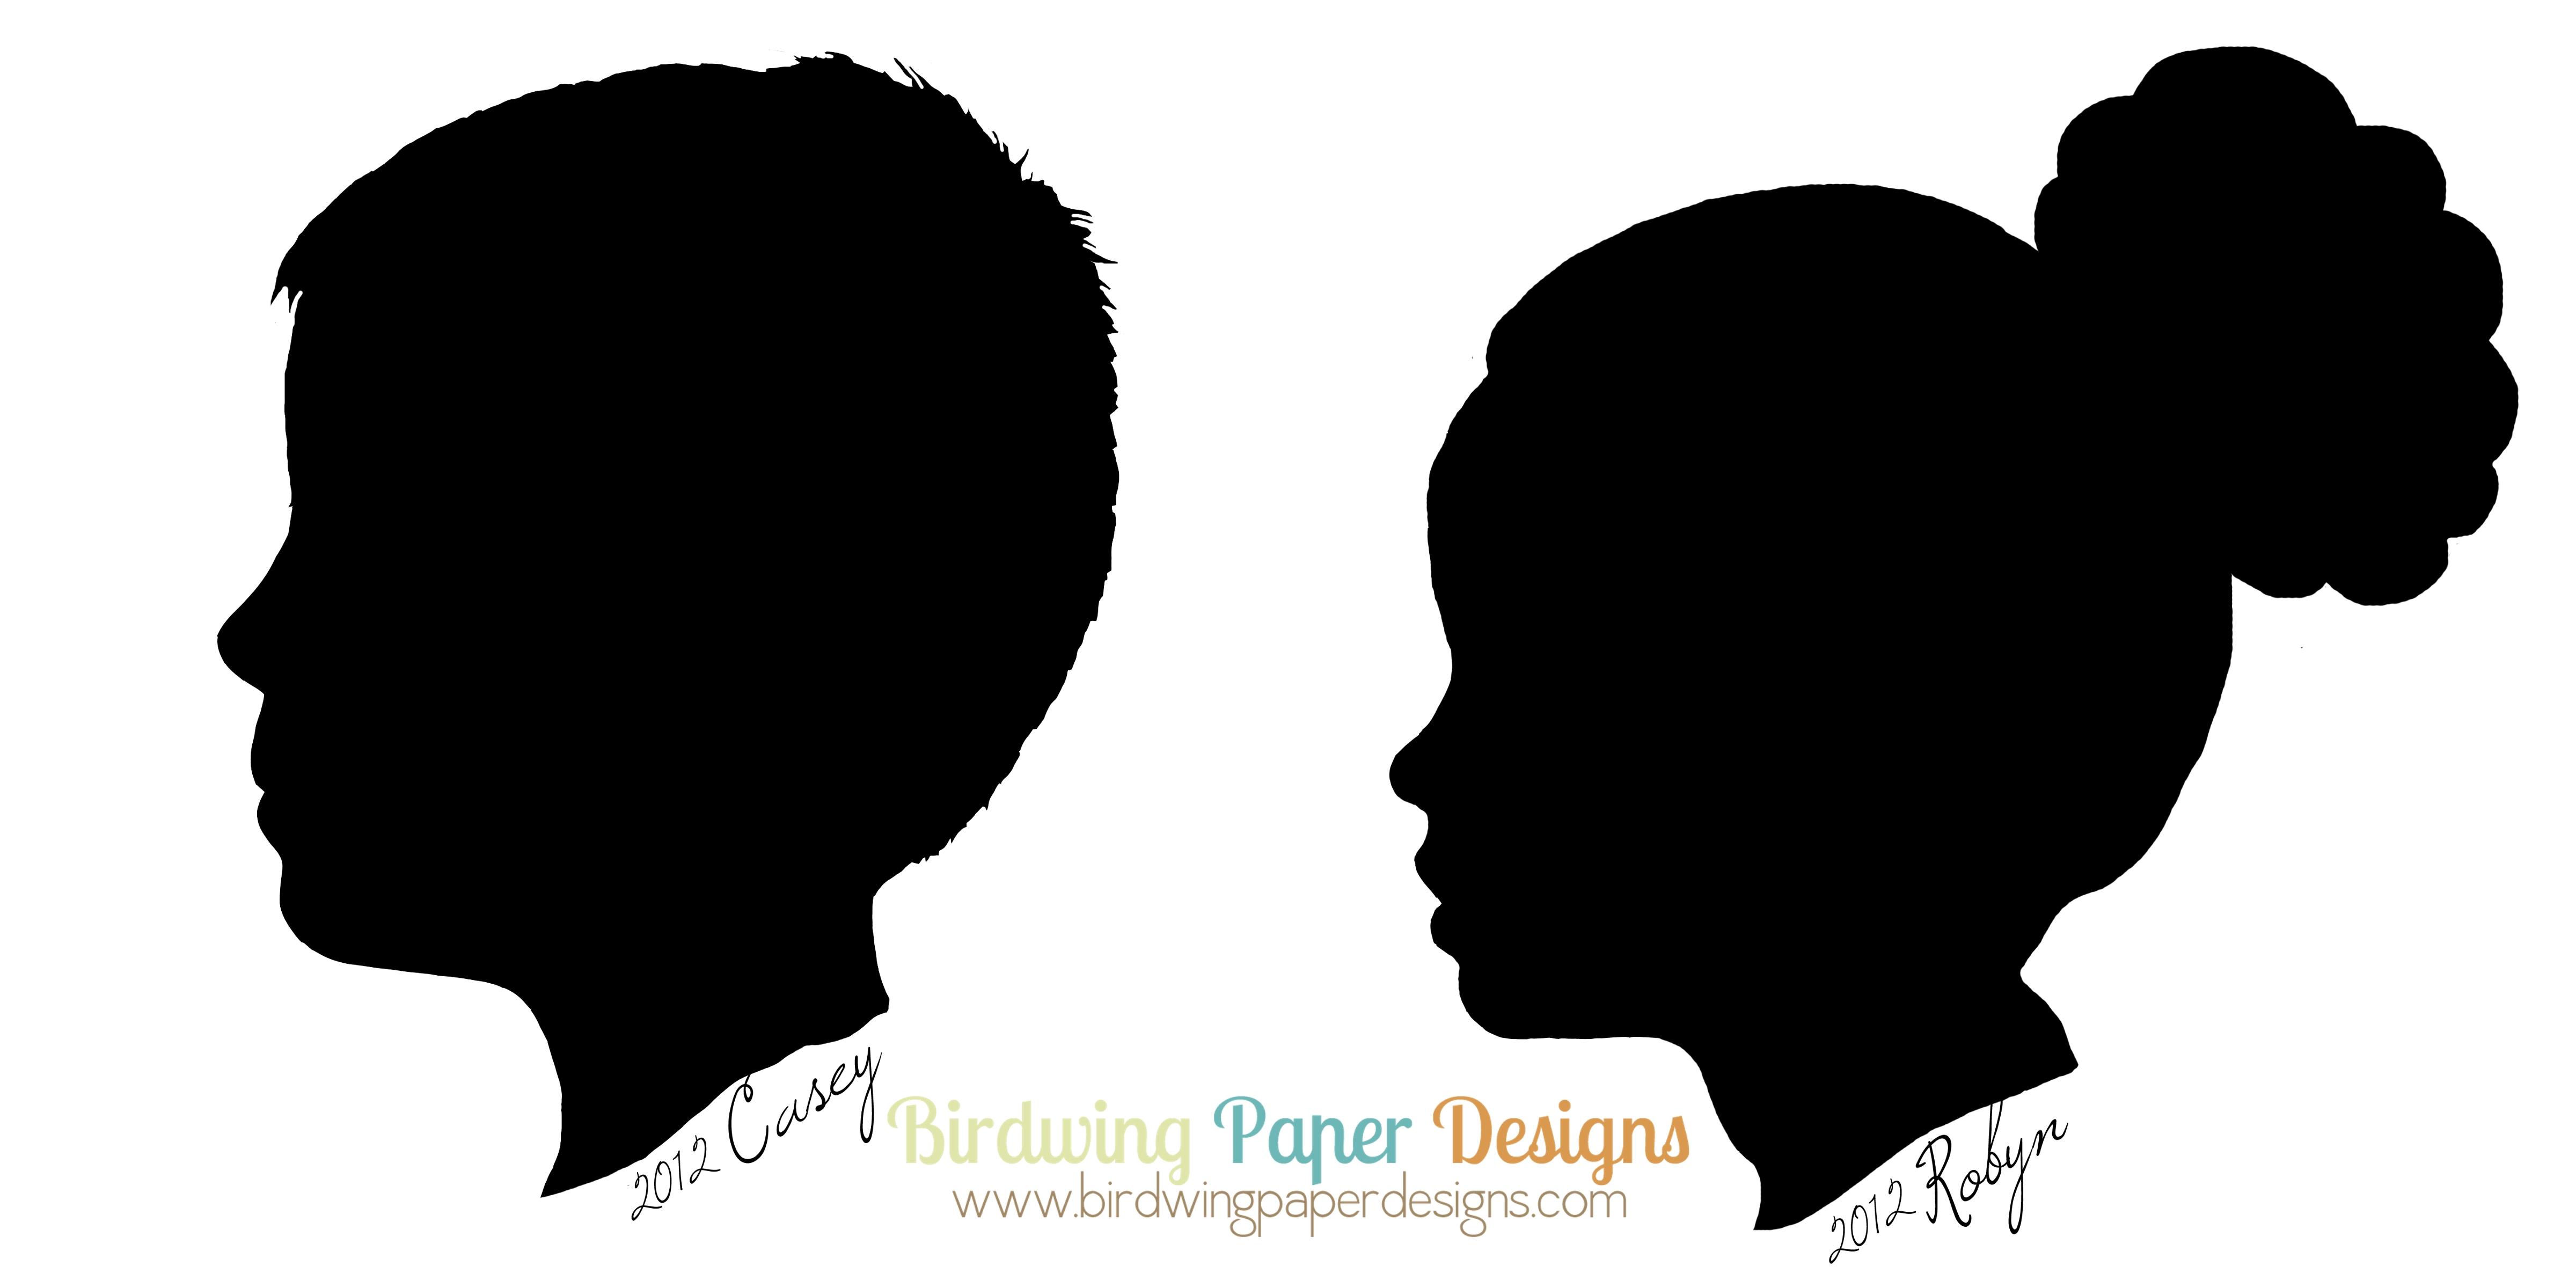 4800x2400 Simple Silhouettes Birdwing Paper Designs